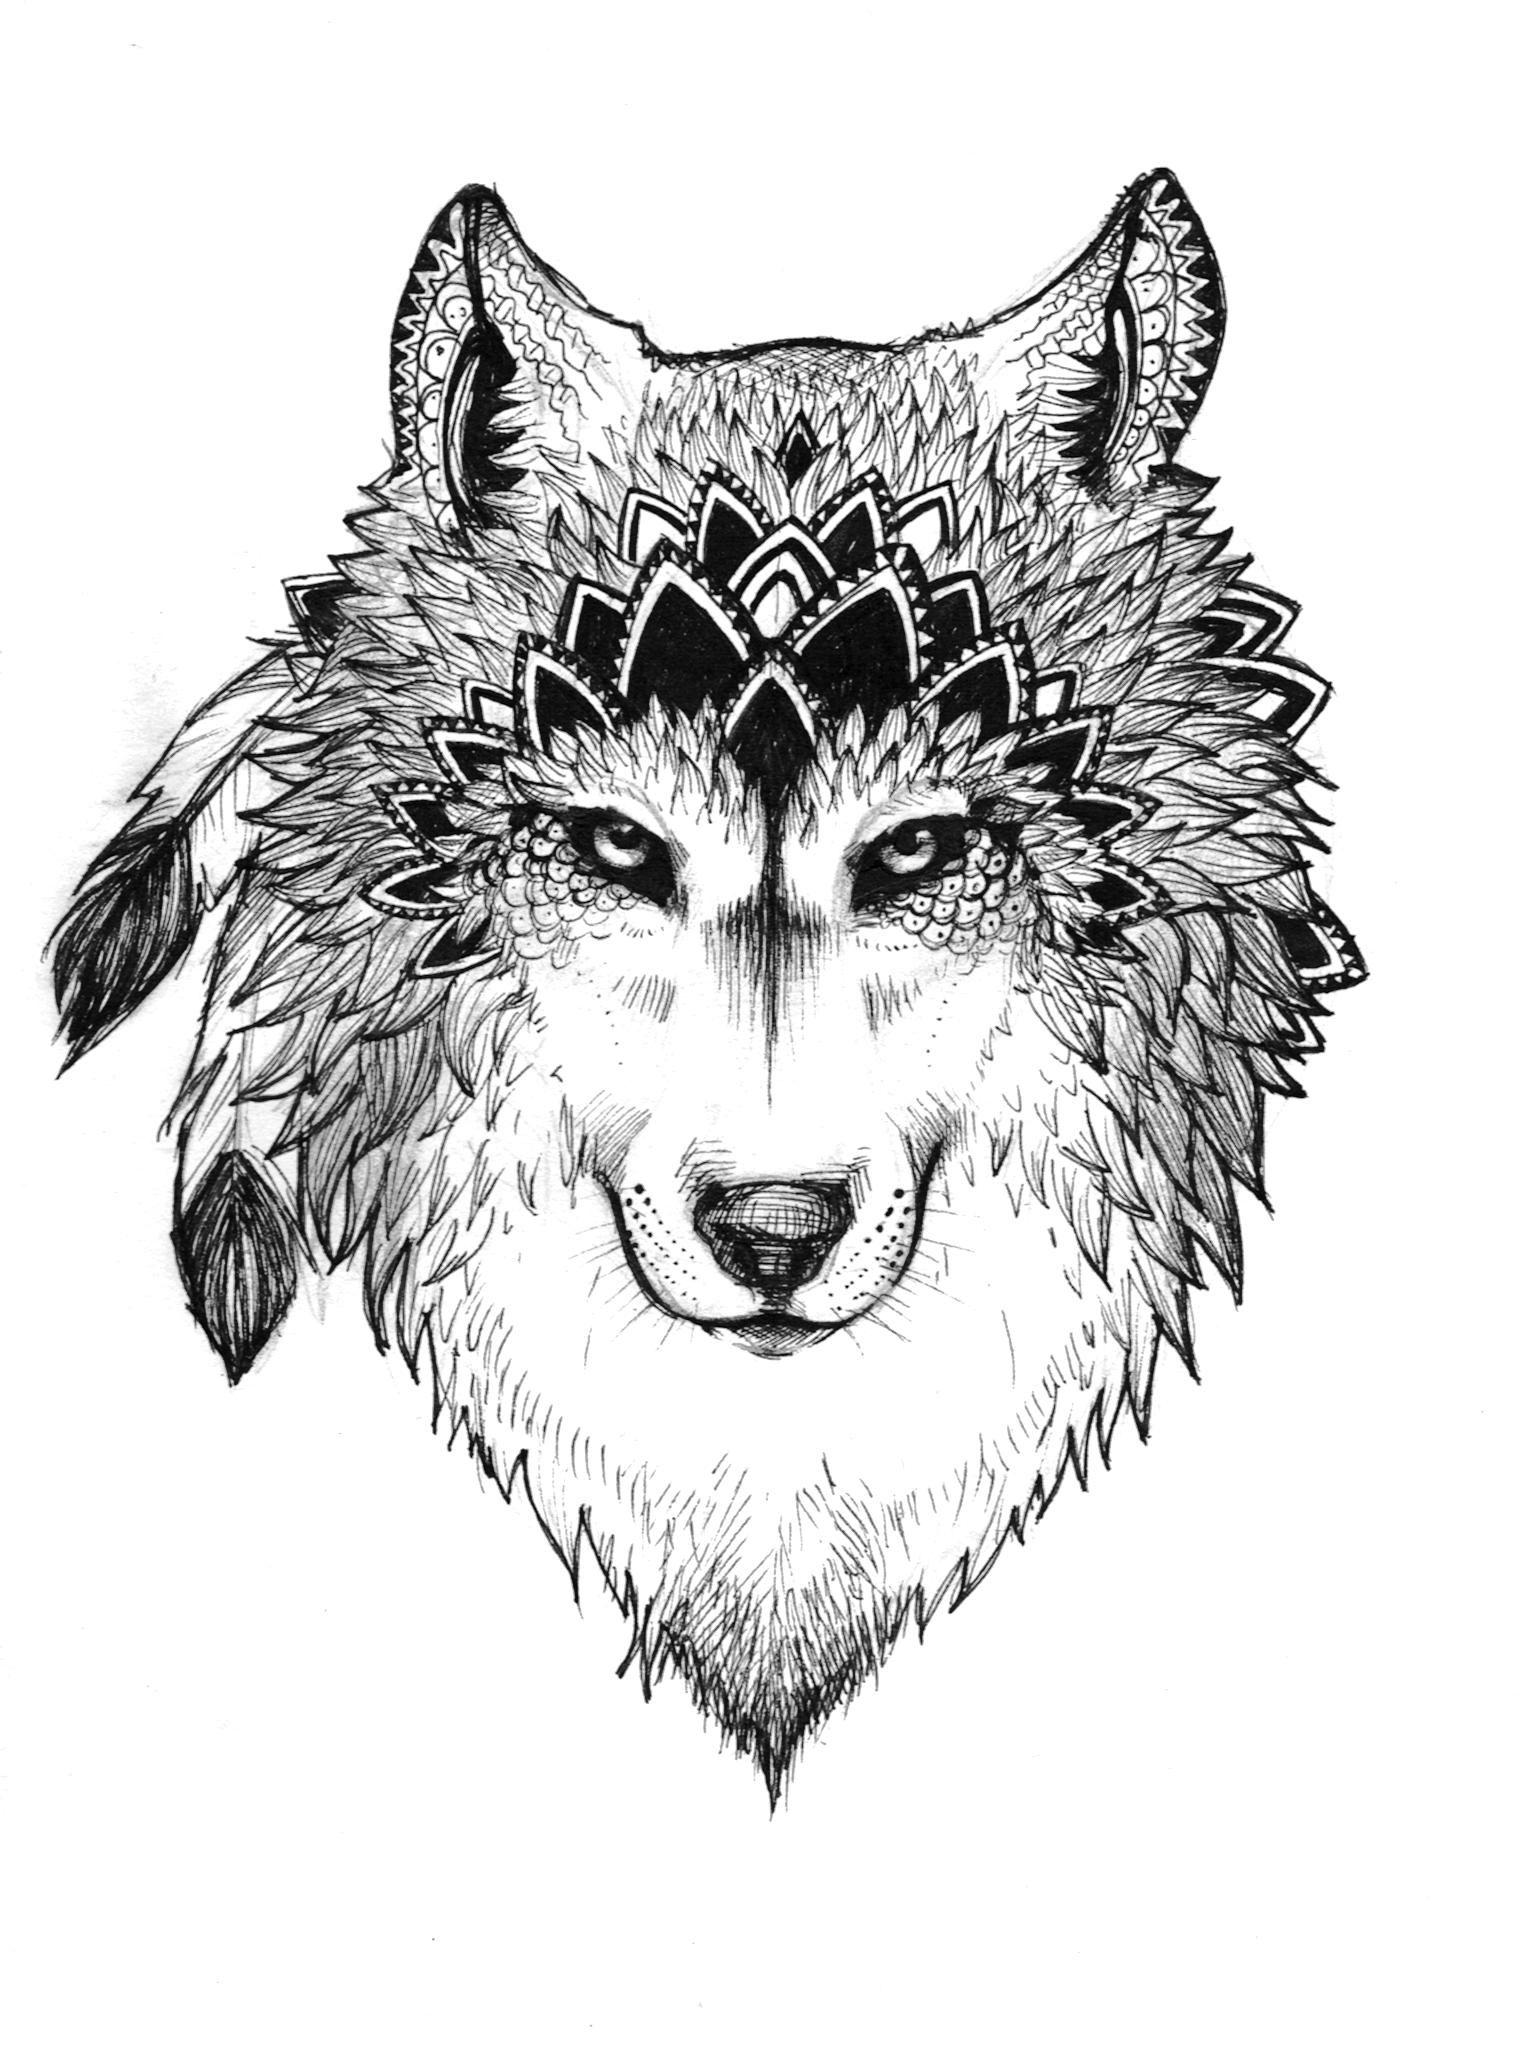 Cute Elephant Design Wallpaper Wolf Illustration Tumblr Www Pixshark Com Images